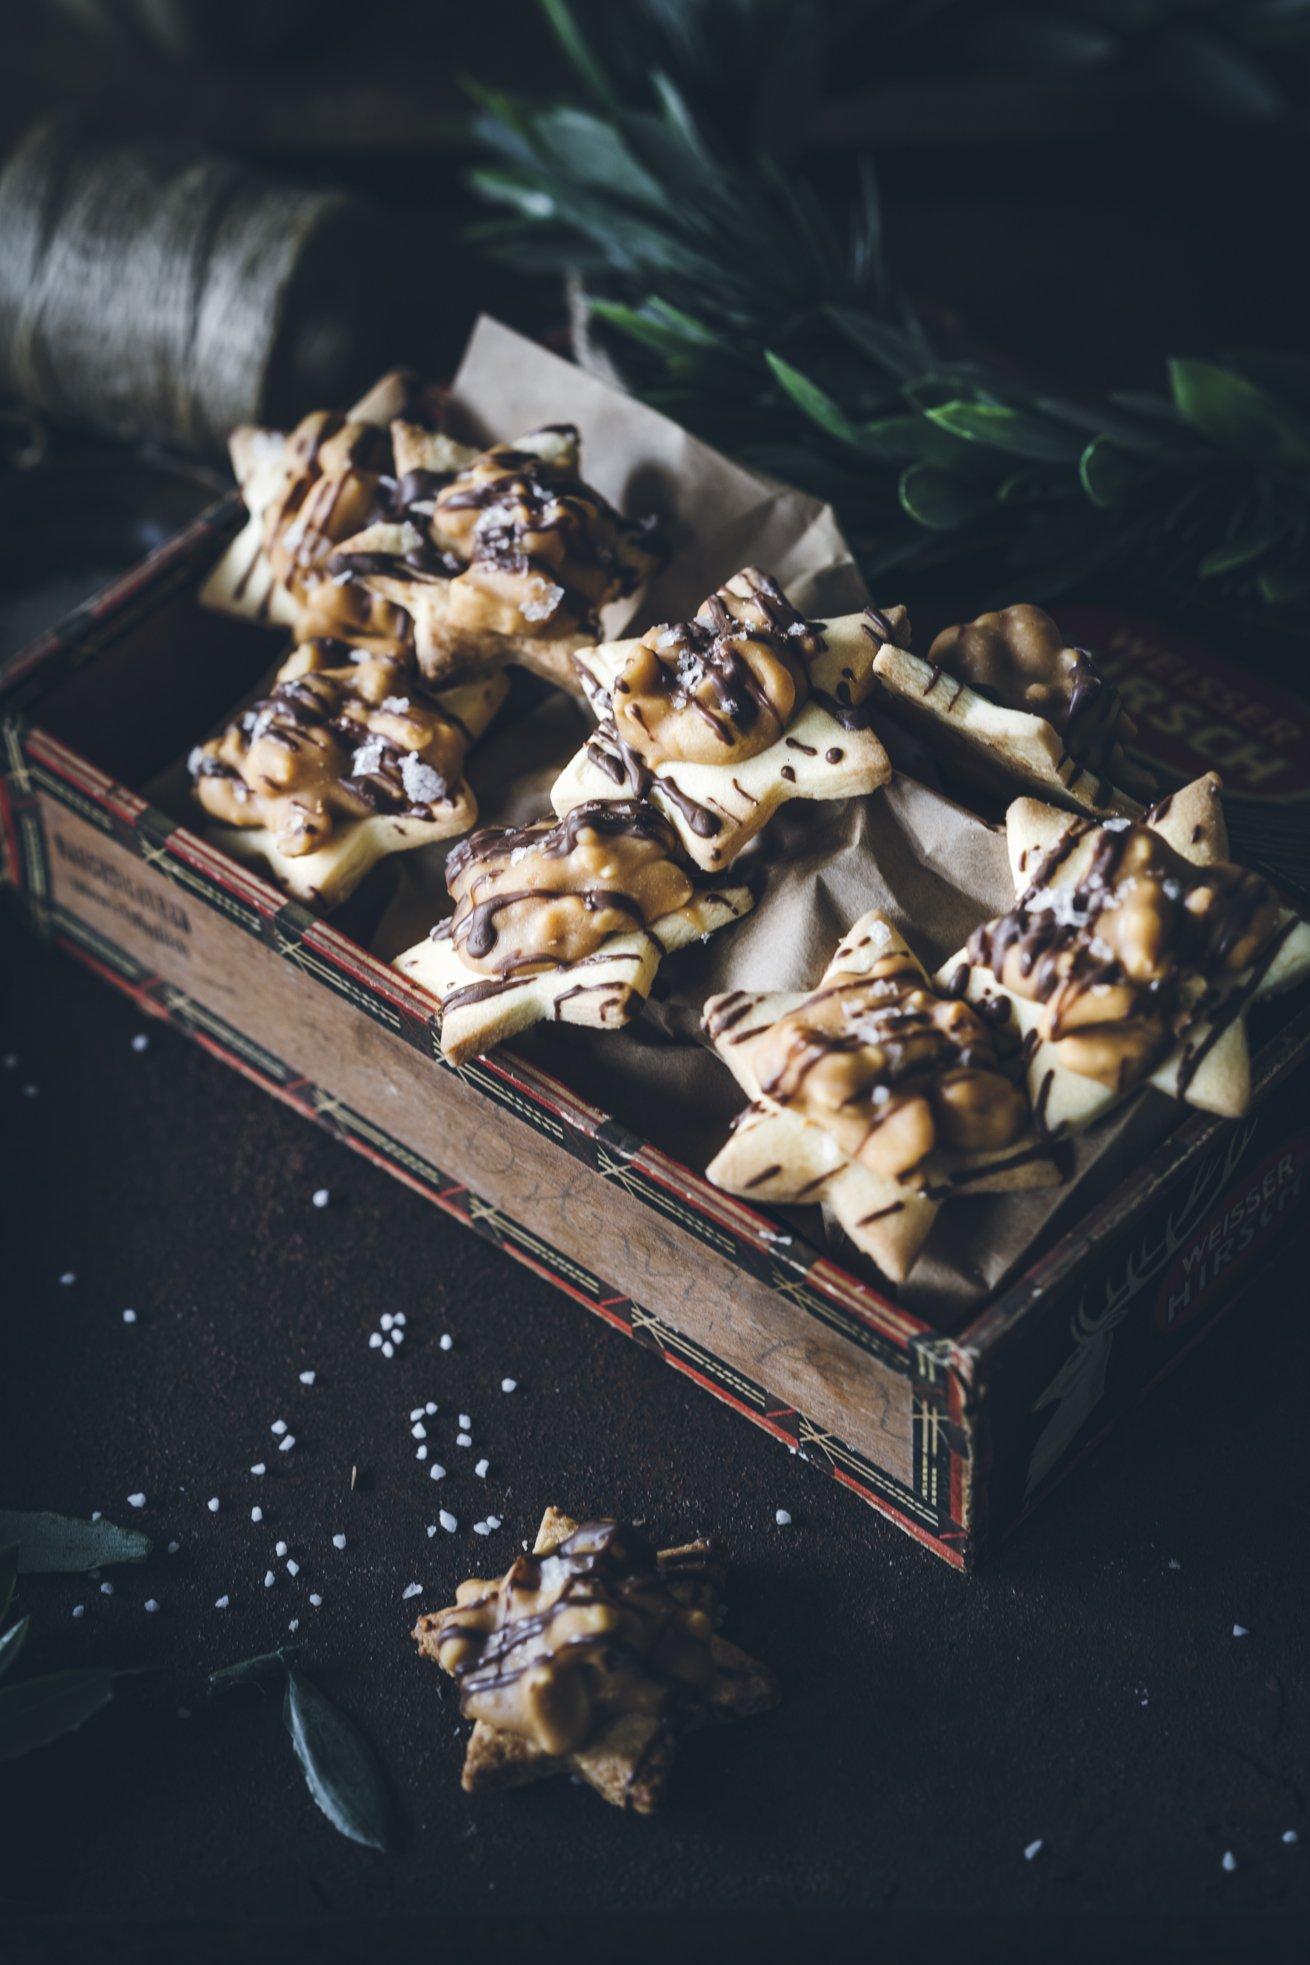 Bestes Rezept für Erdnuss Karamell Kekse